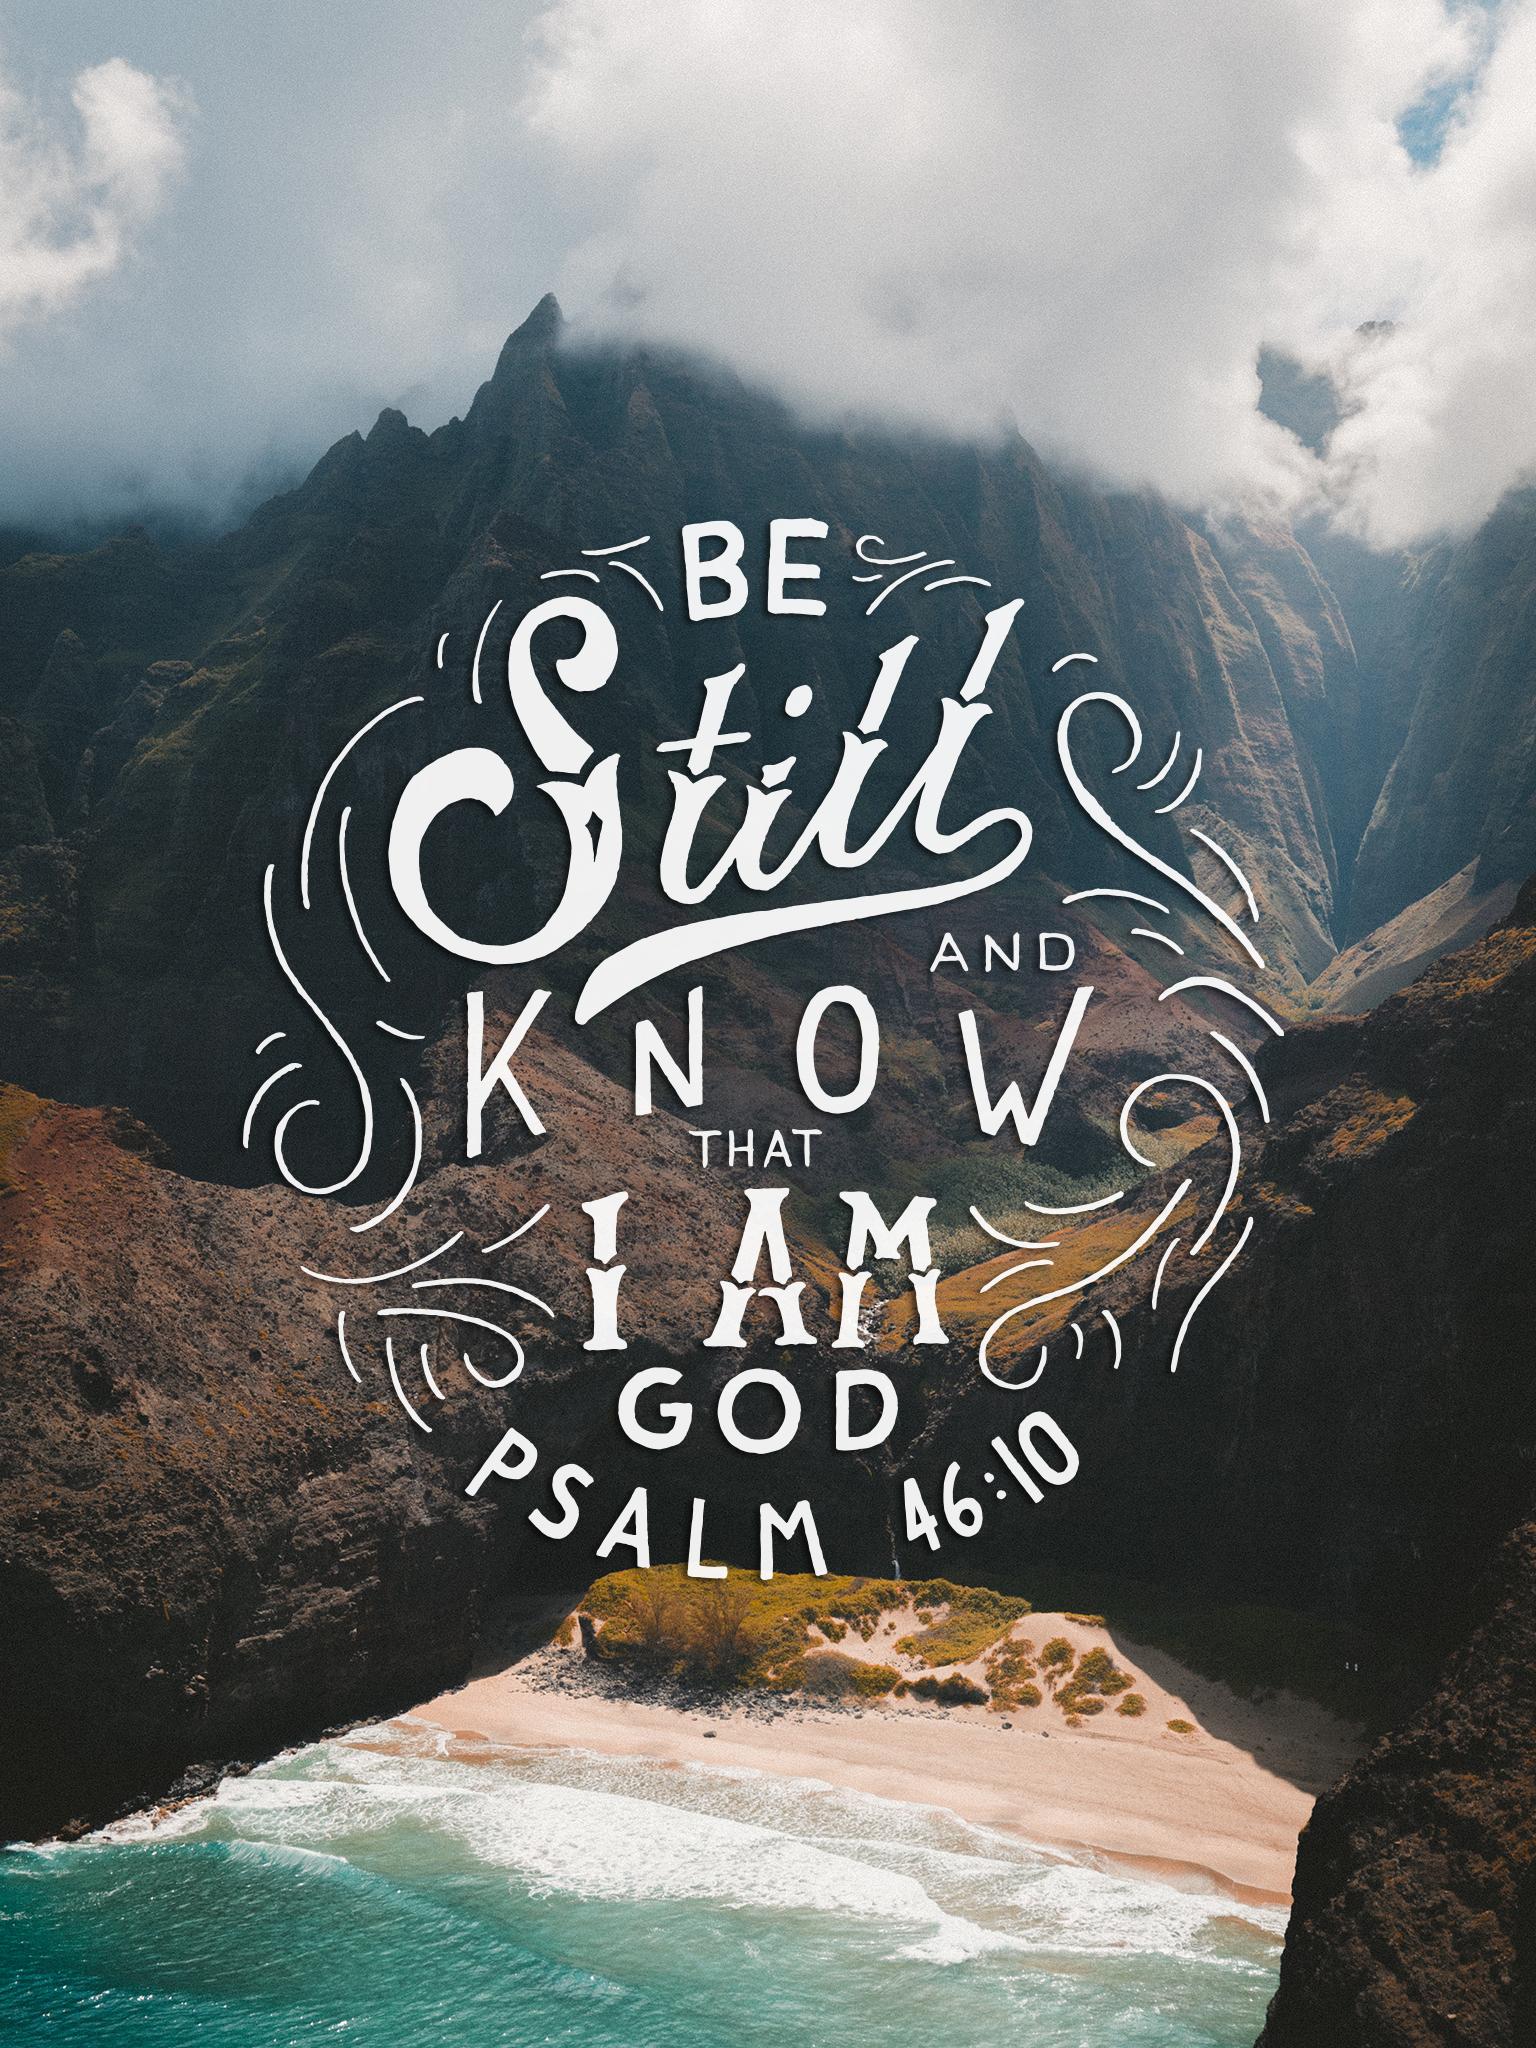 Psalm 4610 Scripture Type